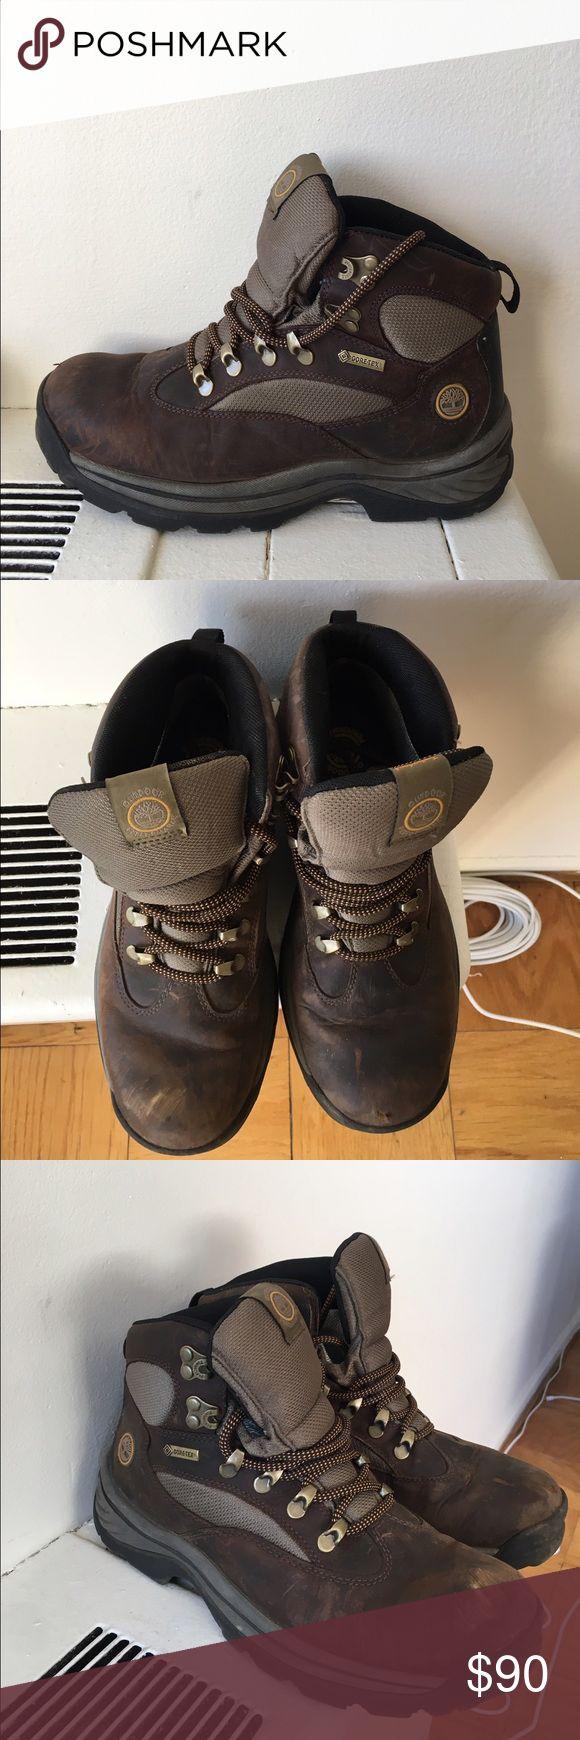 Timberland hiking boots Worn 2 times. Timberland hiking boots Timberland Shoes Winter & Rain Boots